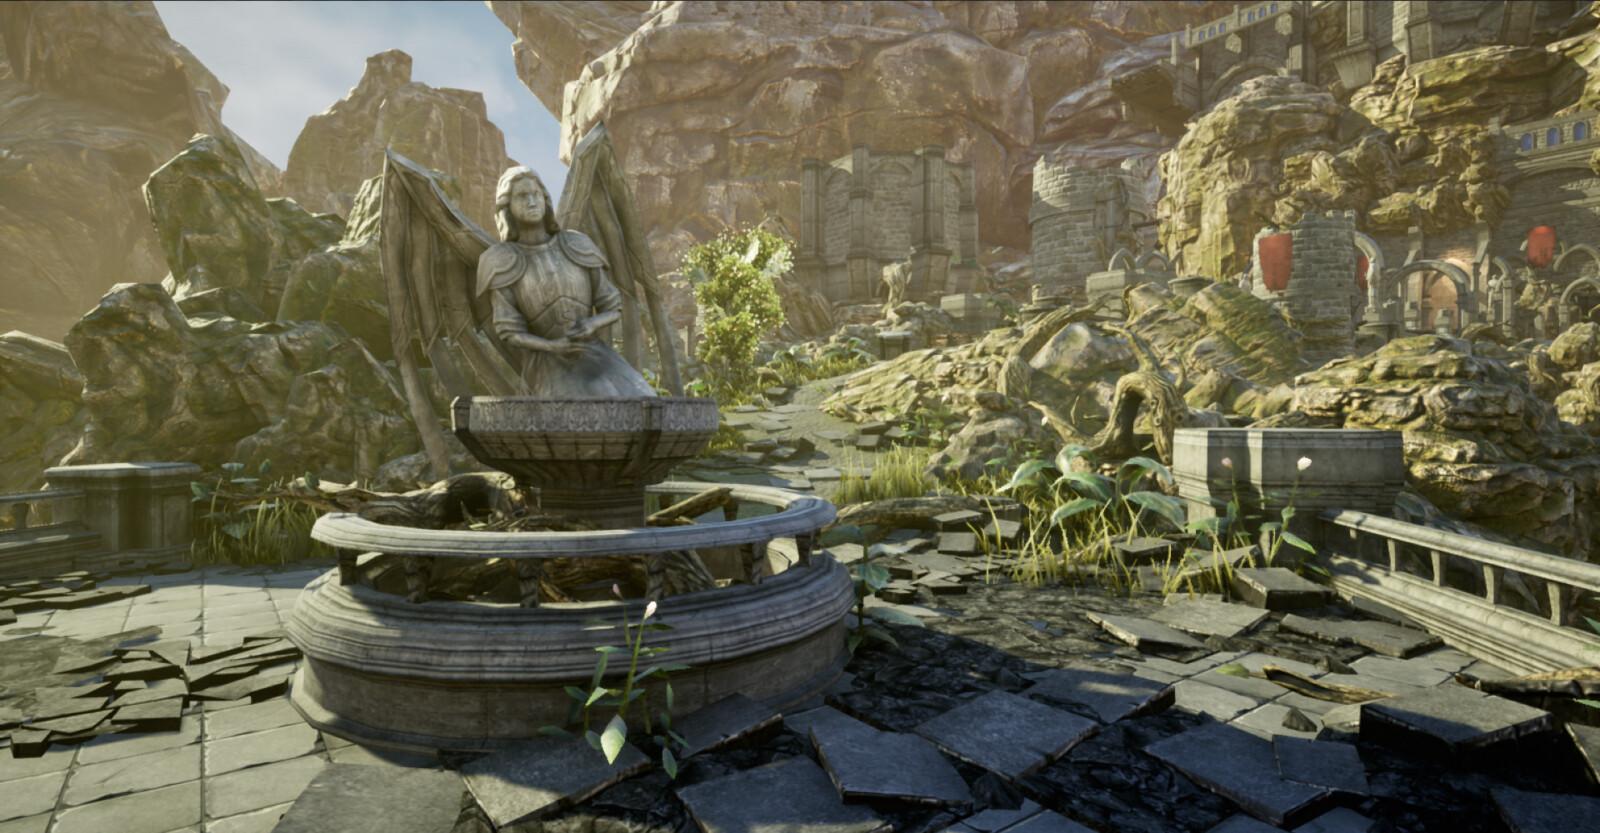 Angel Fountain - Day